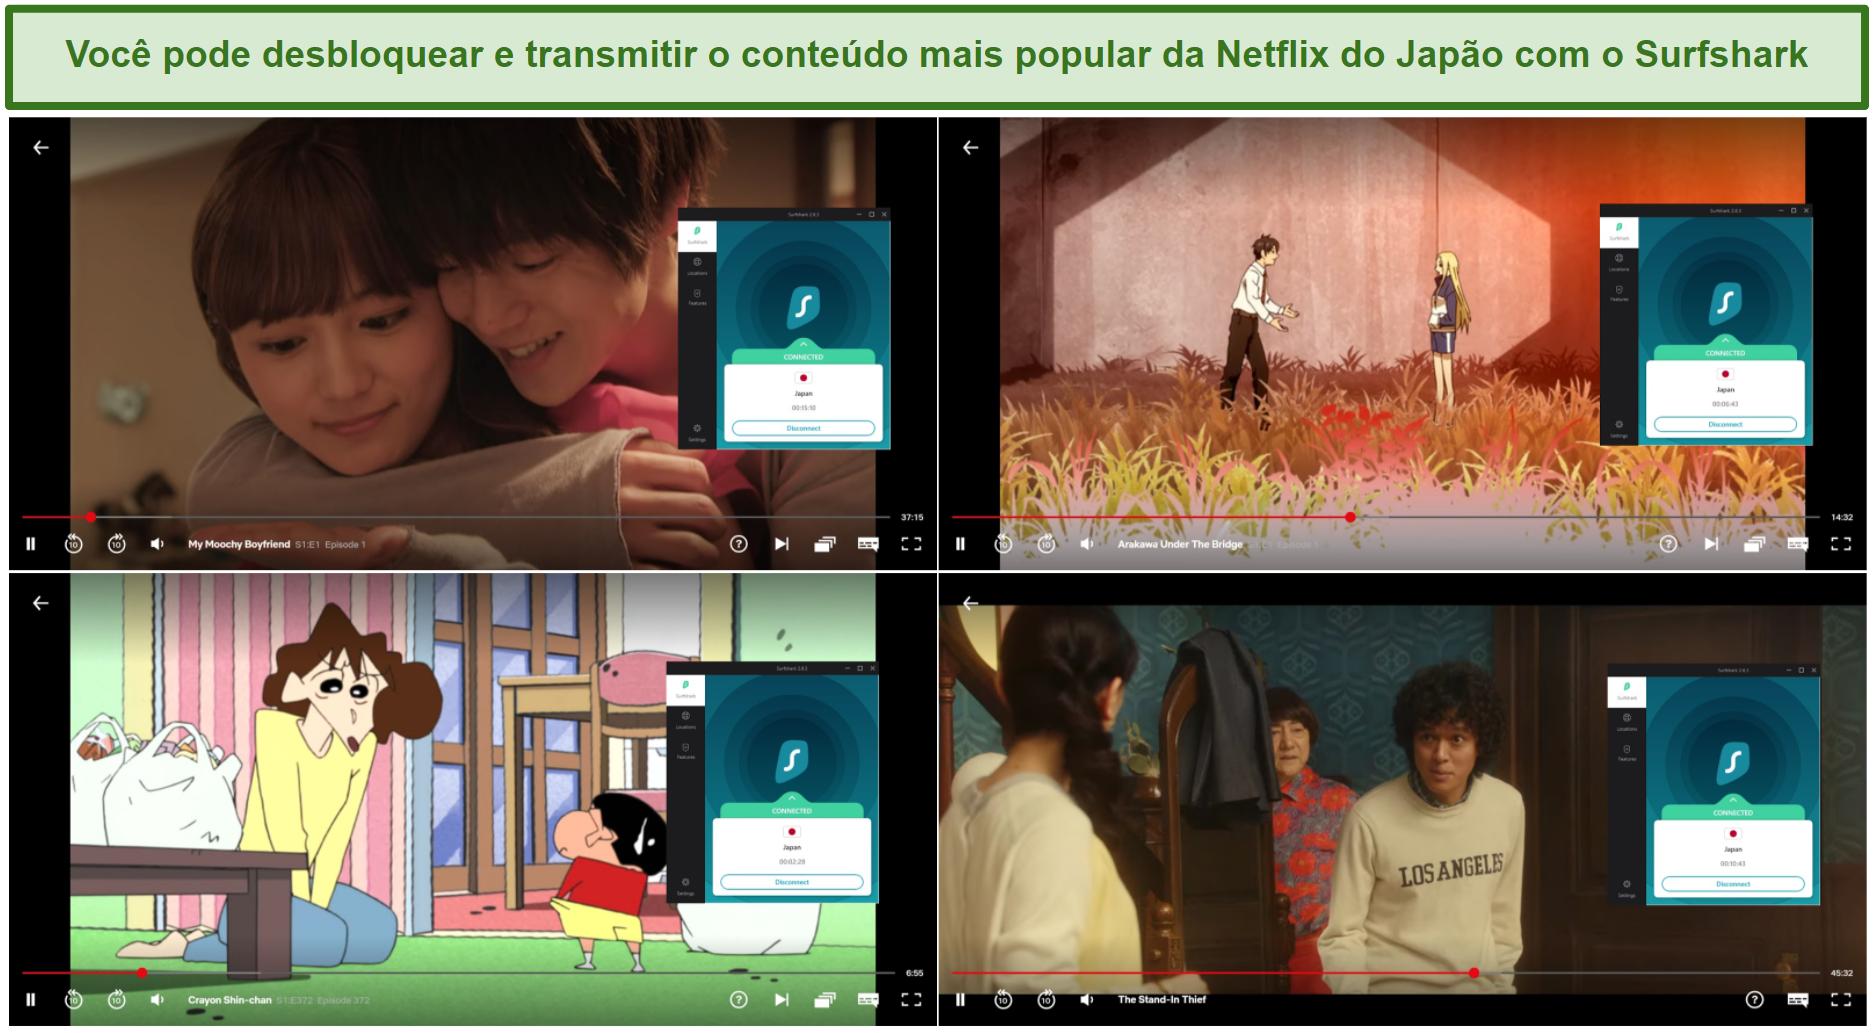 Captura de tela do Surfshark desbloqueando My Moochy Boyfriend, Arakawa Under The Bridge, Crayon Shin-chan e The Stand-in Thief no Netflix Japan